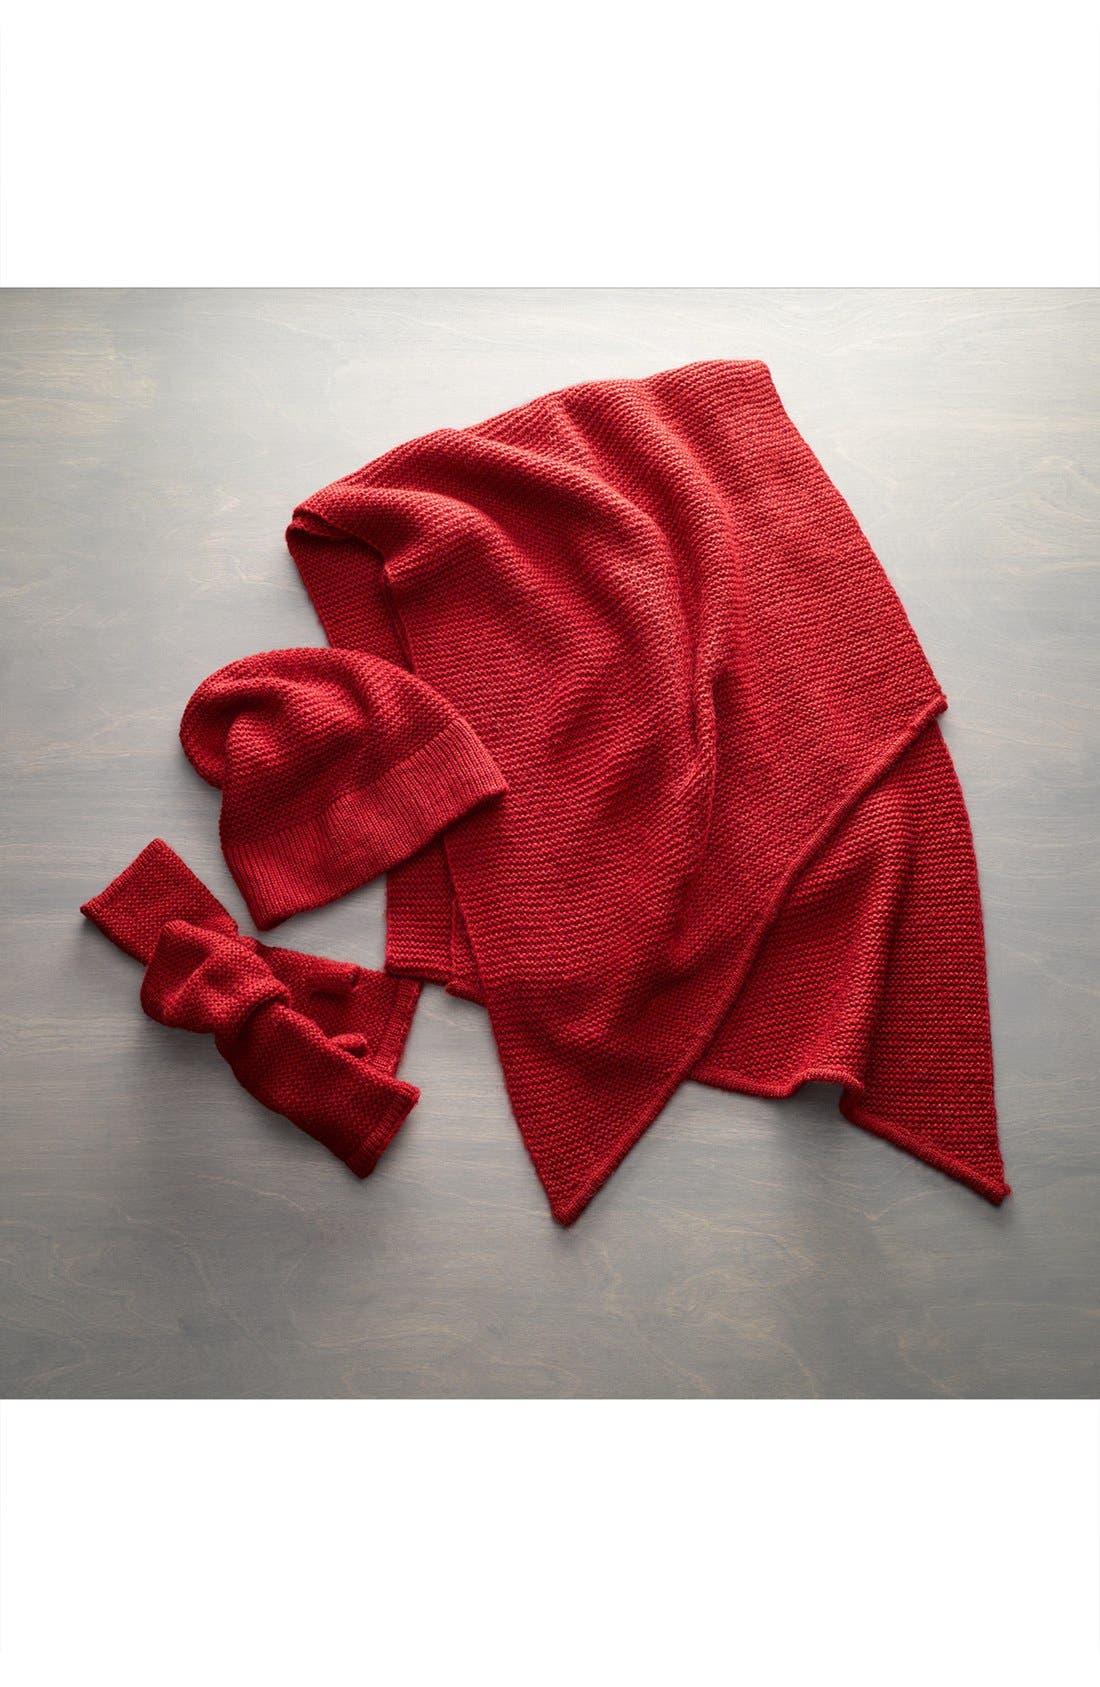 Garter Stitch Fingerless Gloves,                             Main thumbnail 1, color,                             021